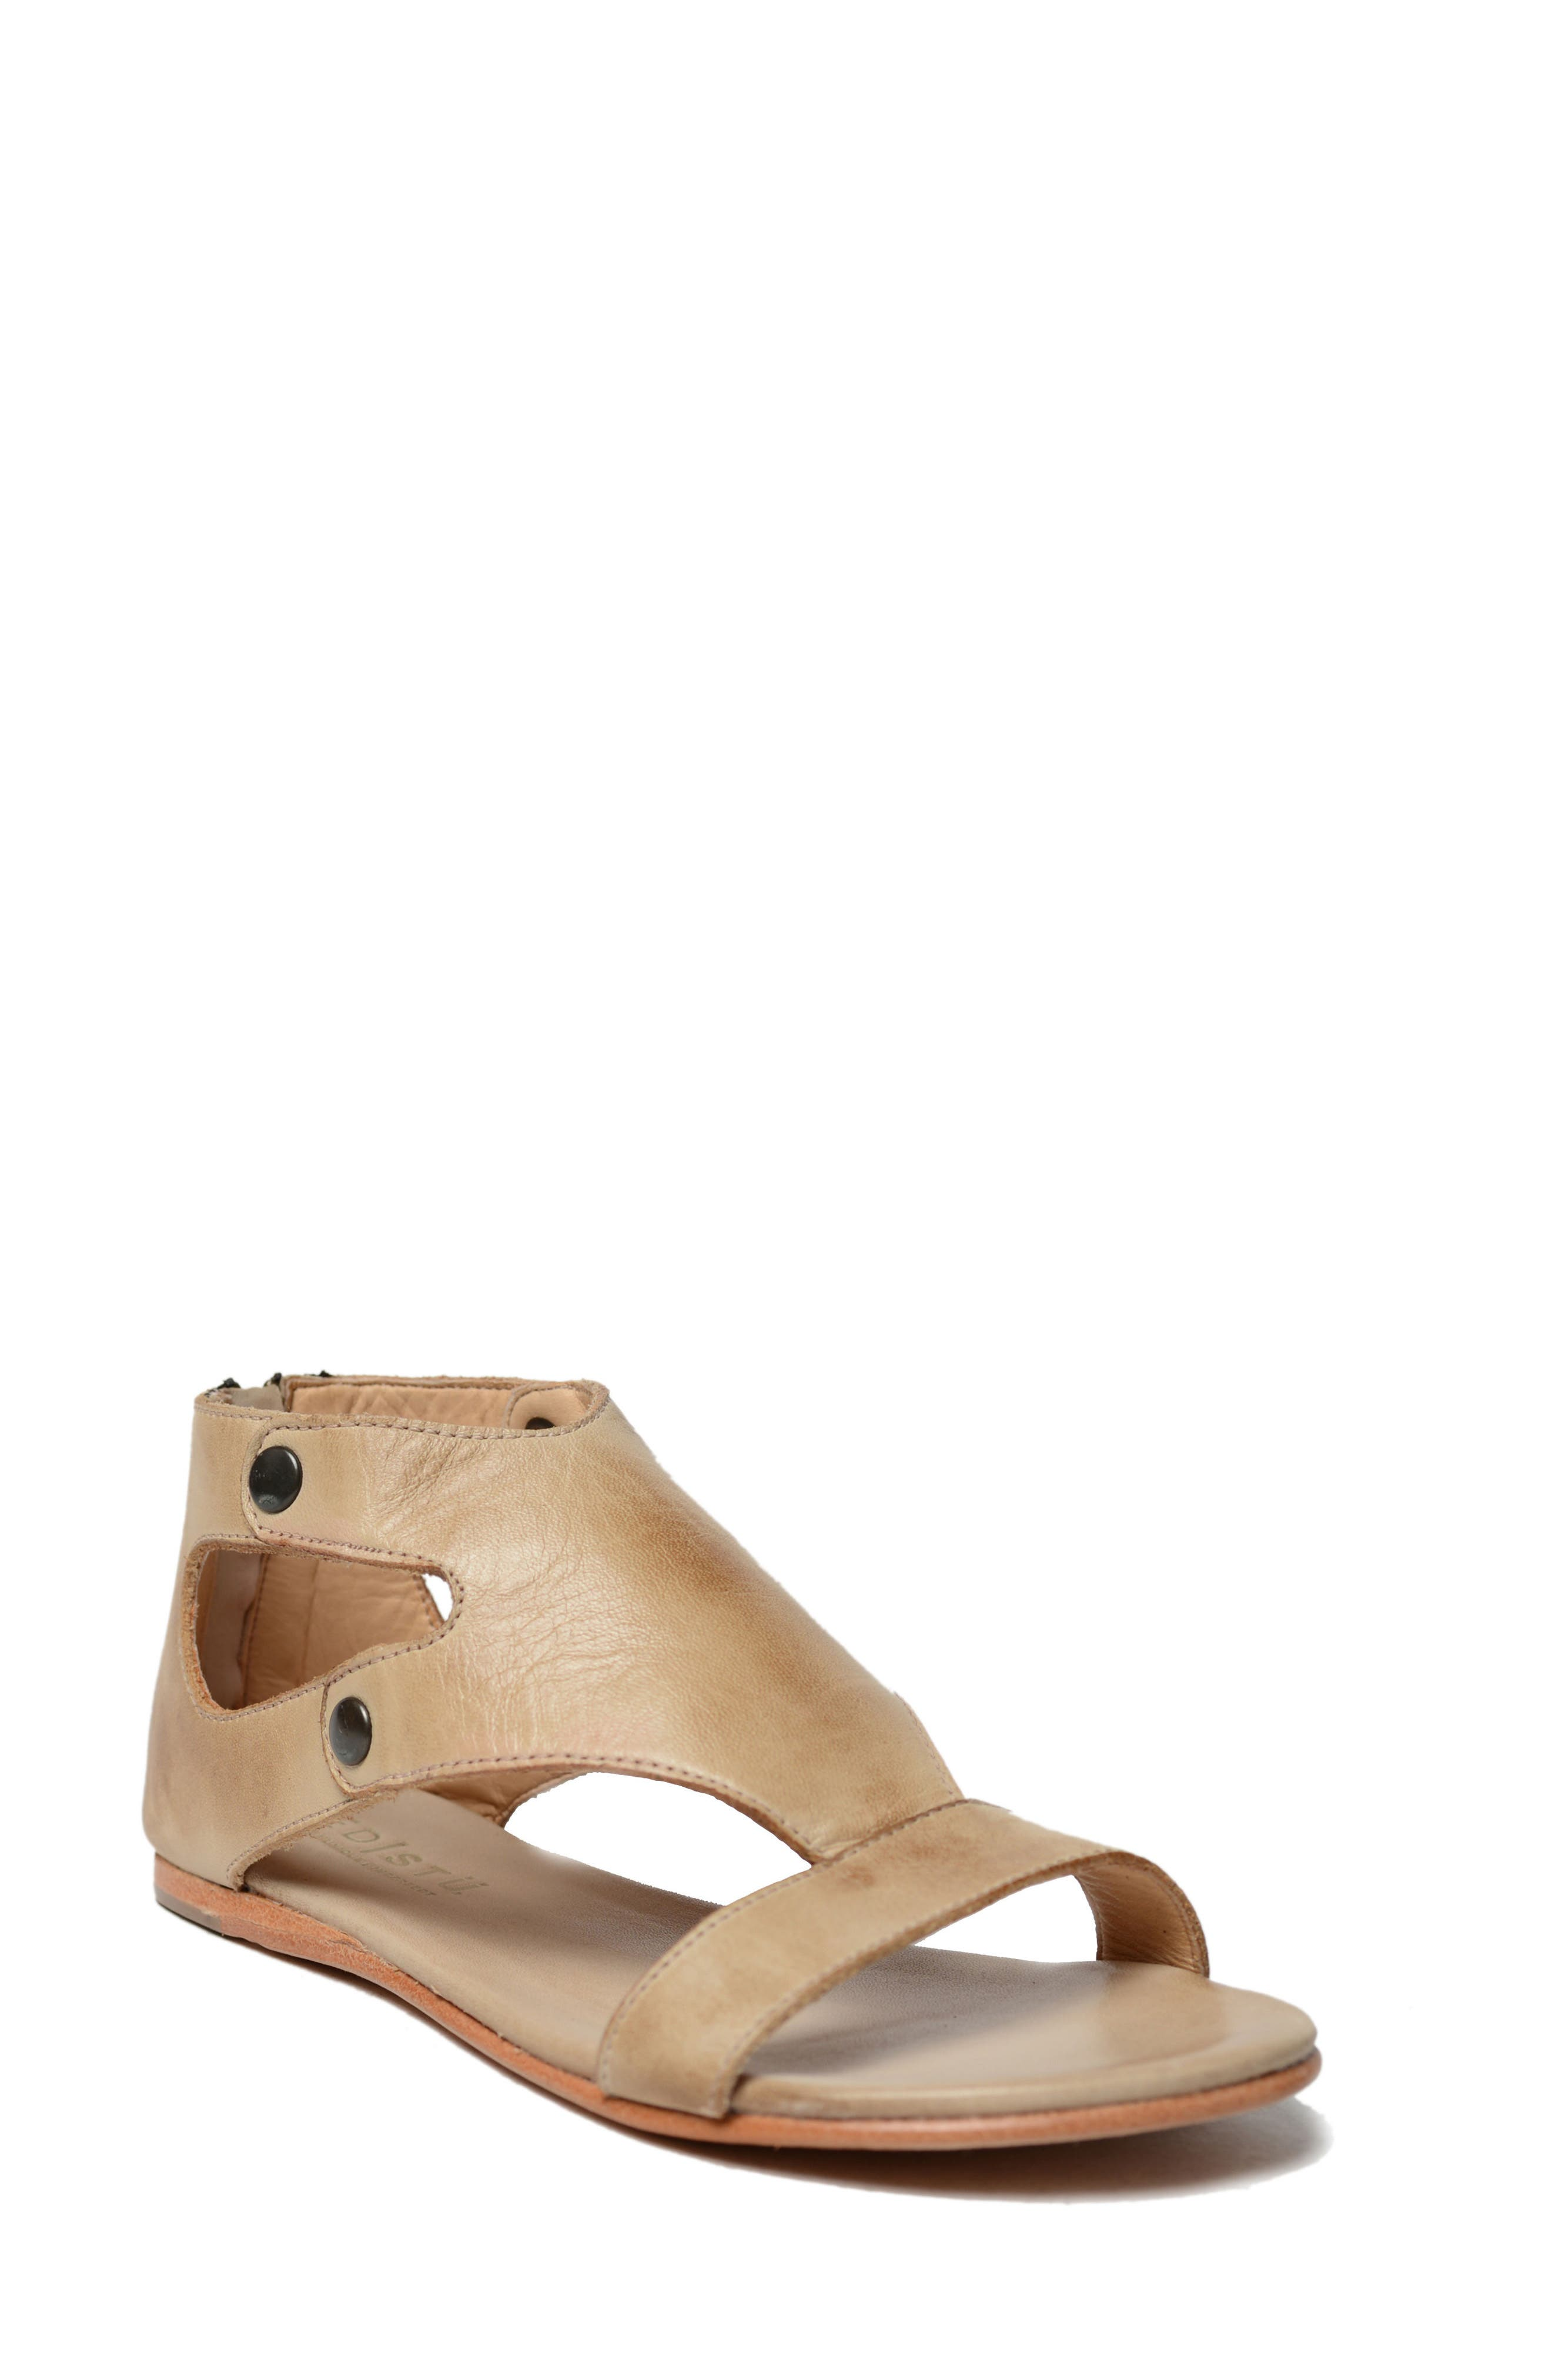 Soto Sandal,                         Main,                         color, Sand Rustic Leather